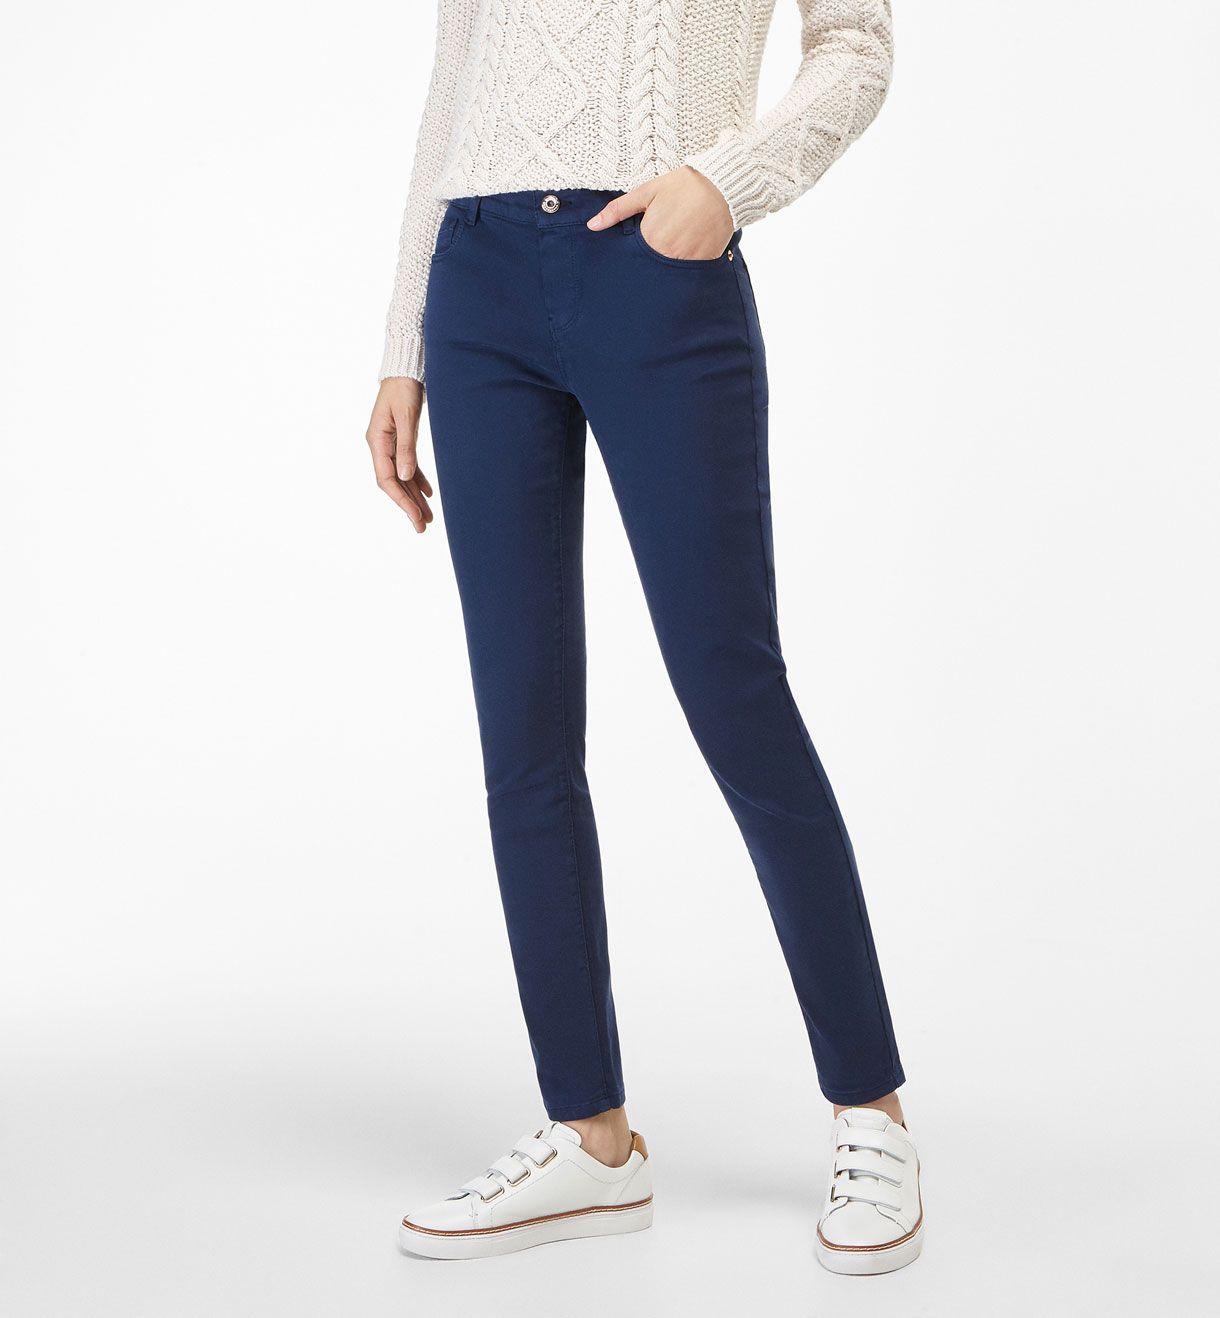 SATIN TROUSERS - View all - Trousers - WOMEN - Ireland - Massimo Dutti